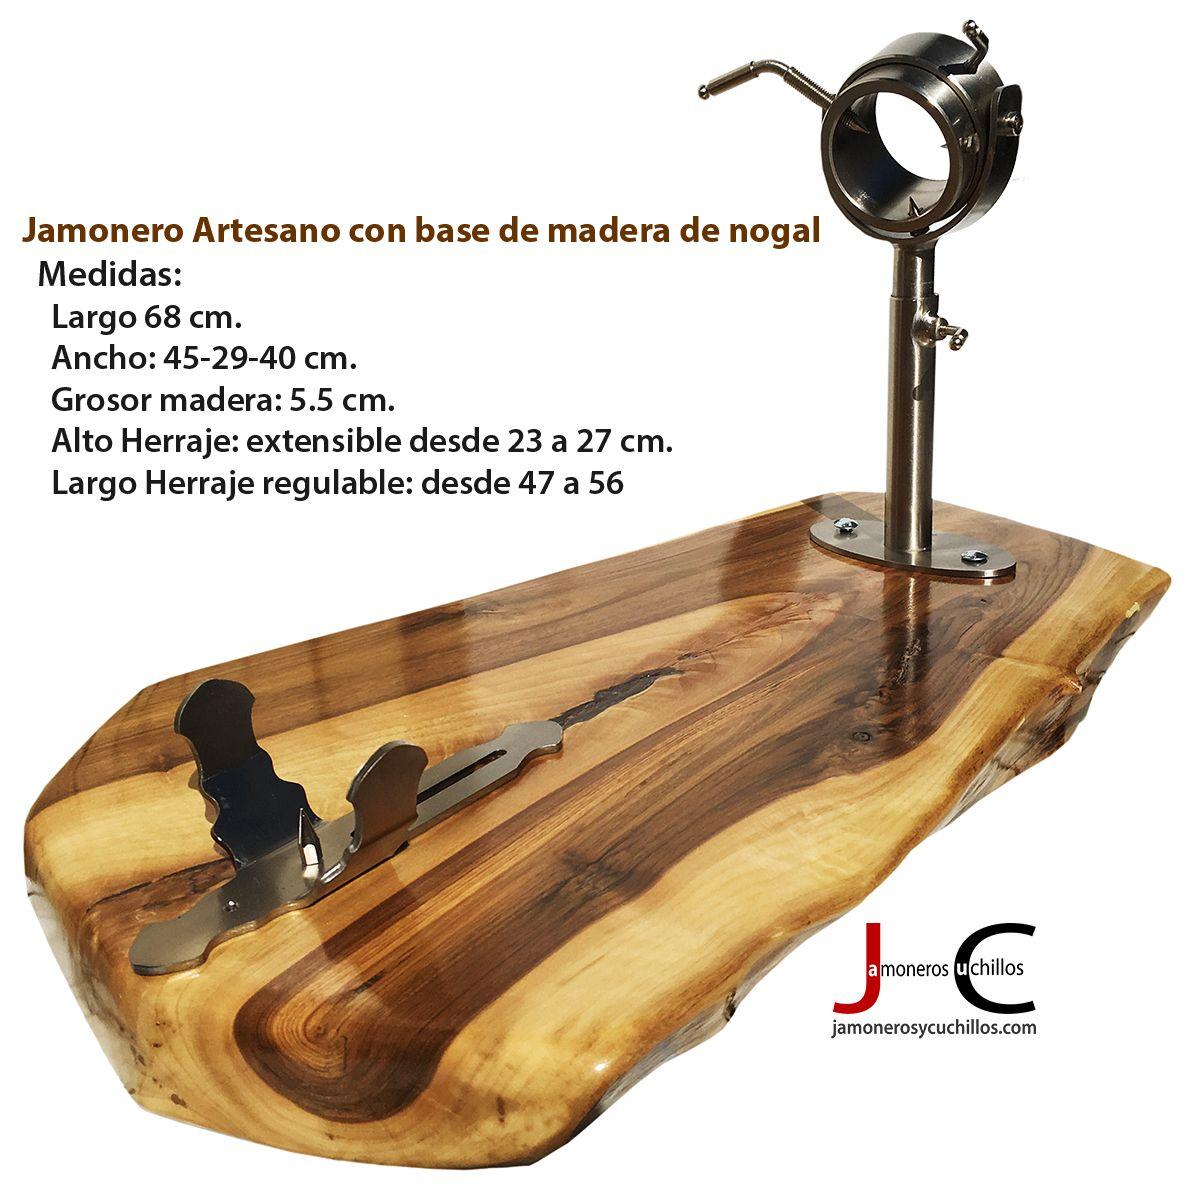 jamonero artesano giratorio regulable de nogal 3 ANCHO 45 cm